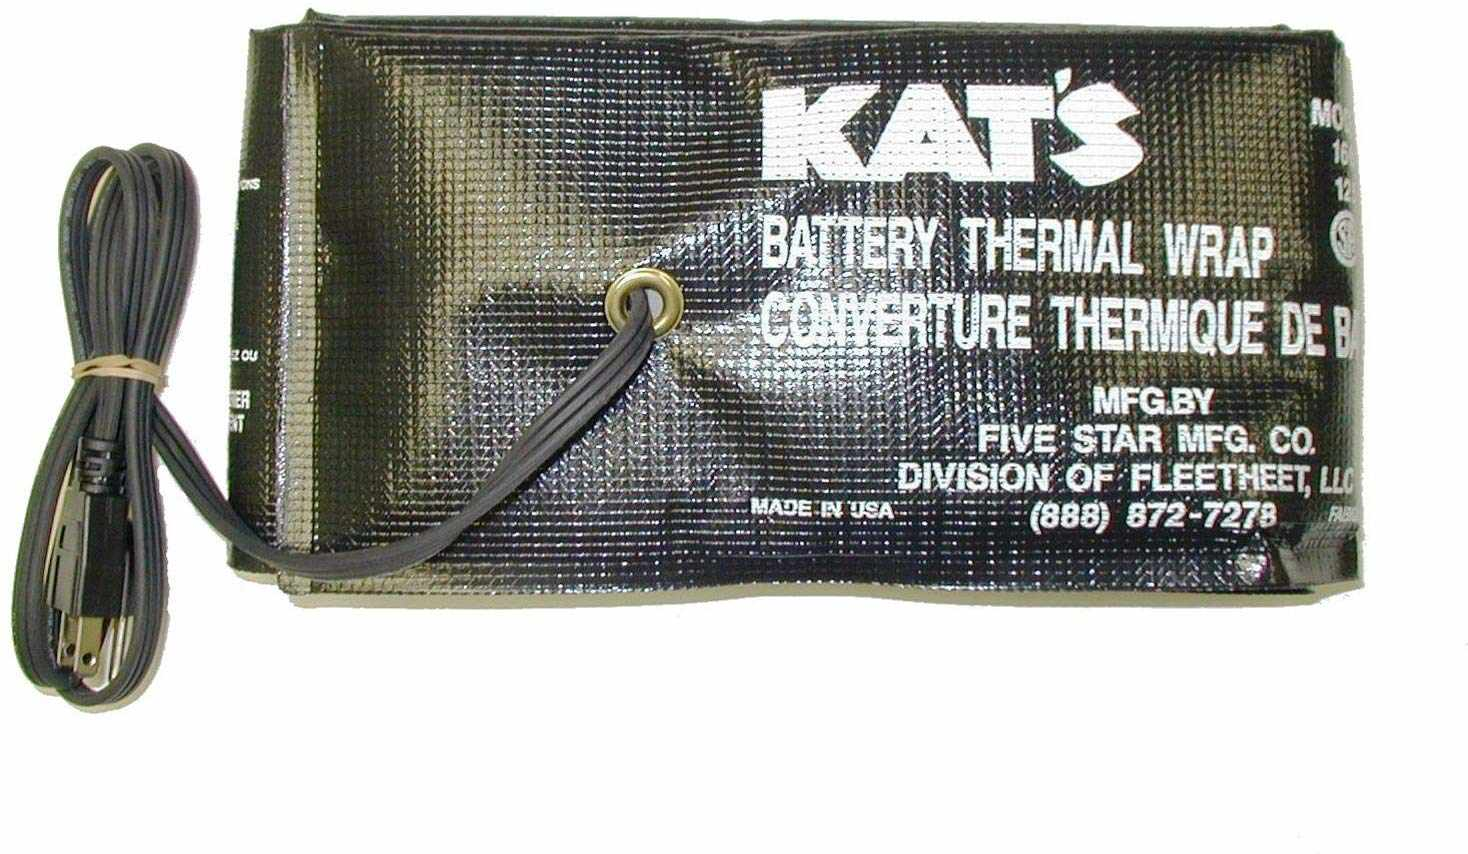 "Kat's 22200 80 Watt 36"" Battery Thermal Wrap"